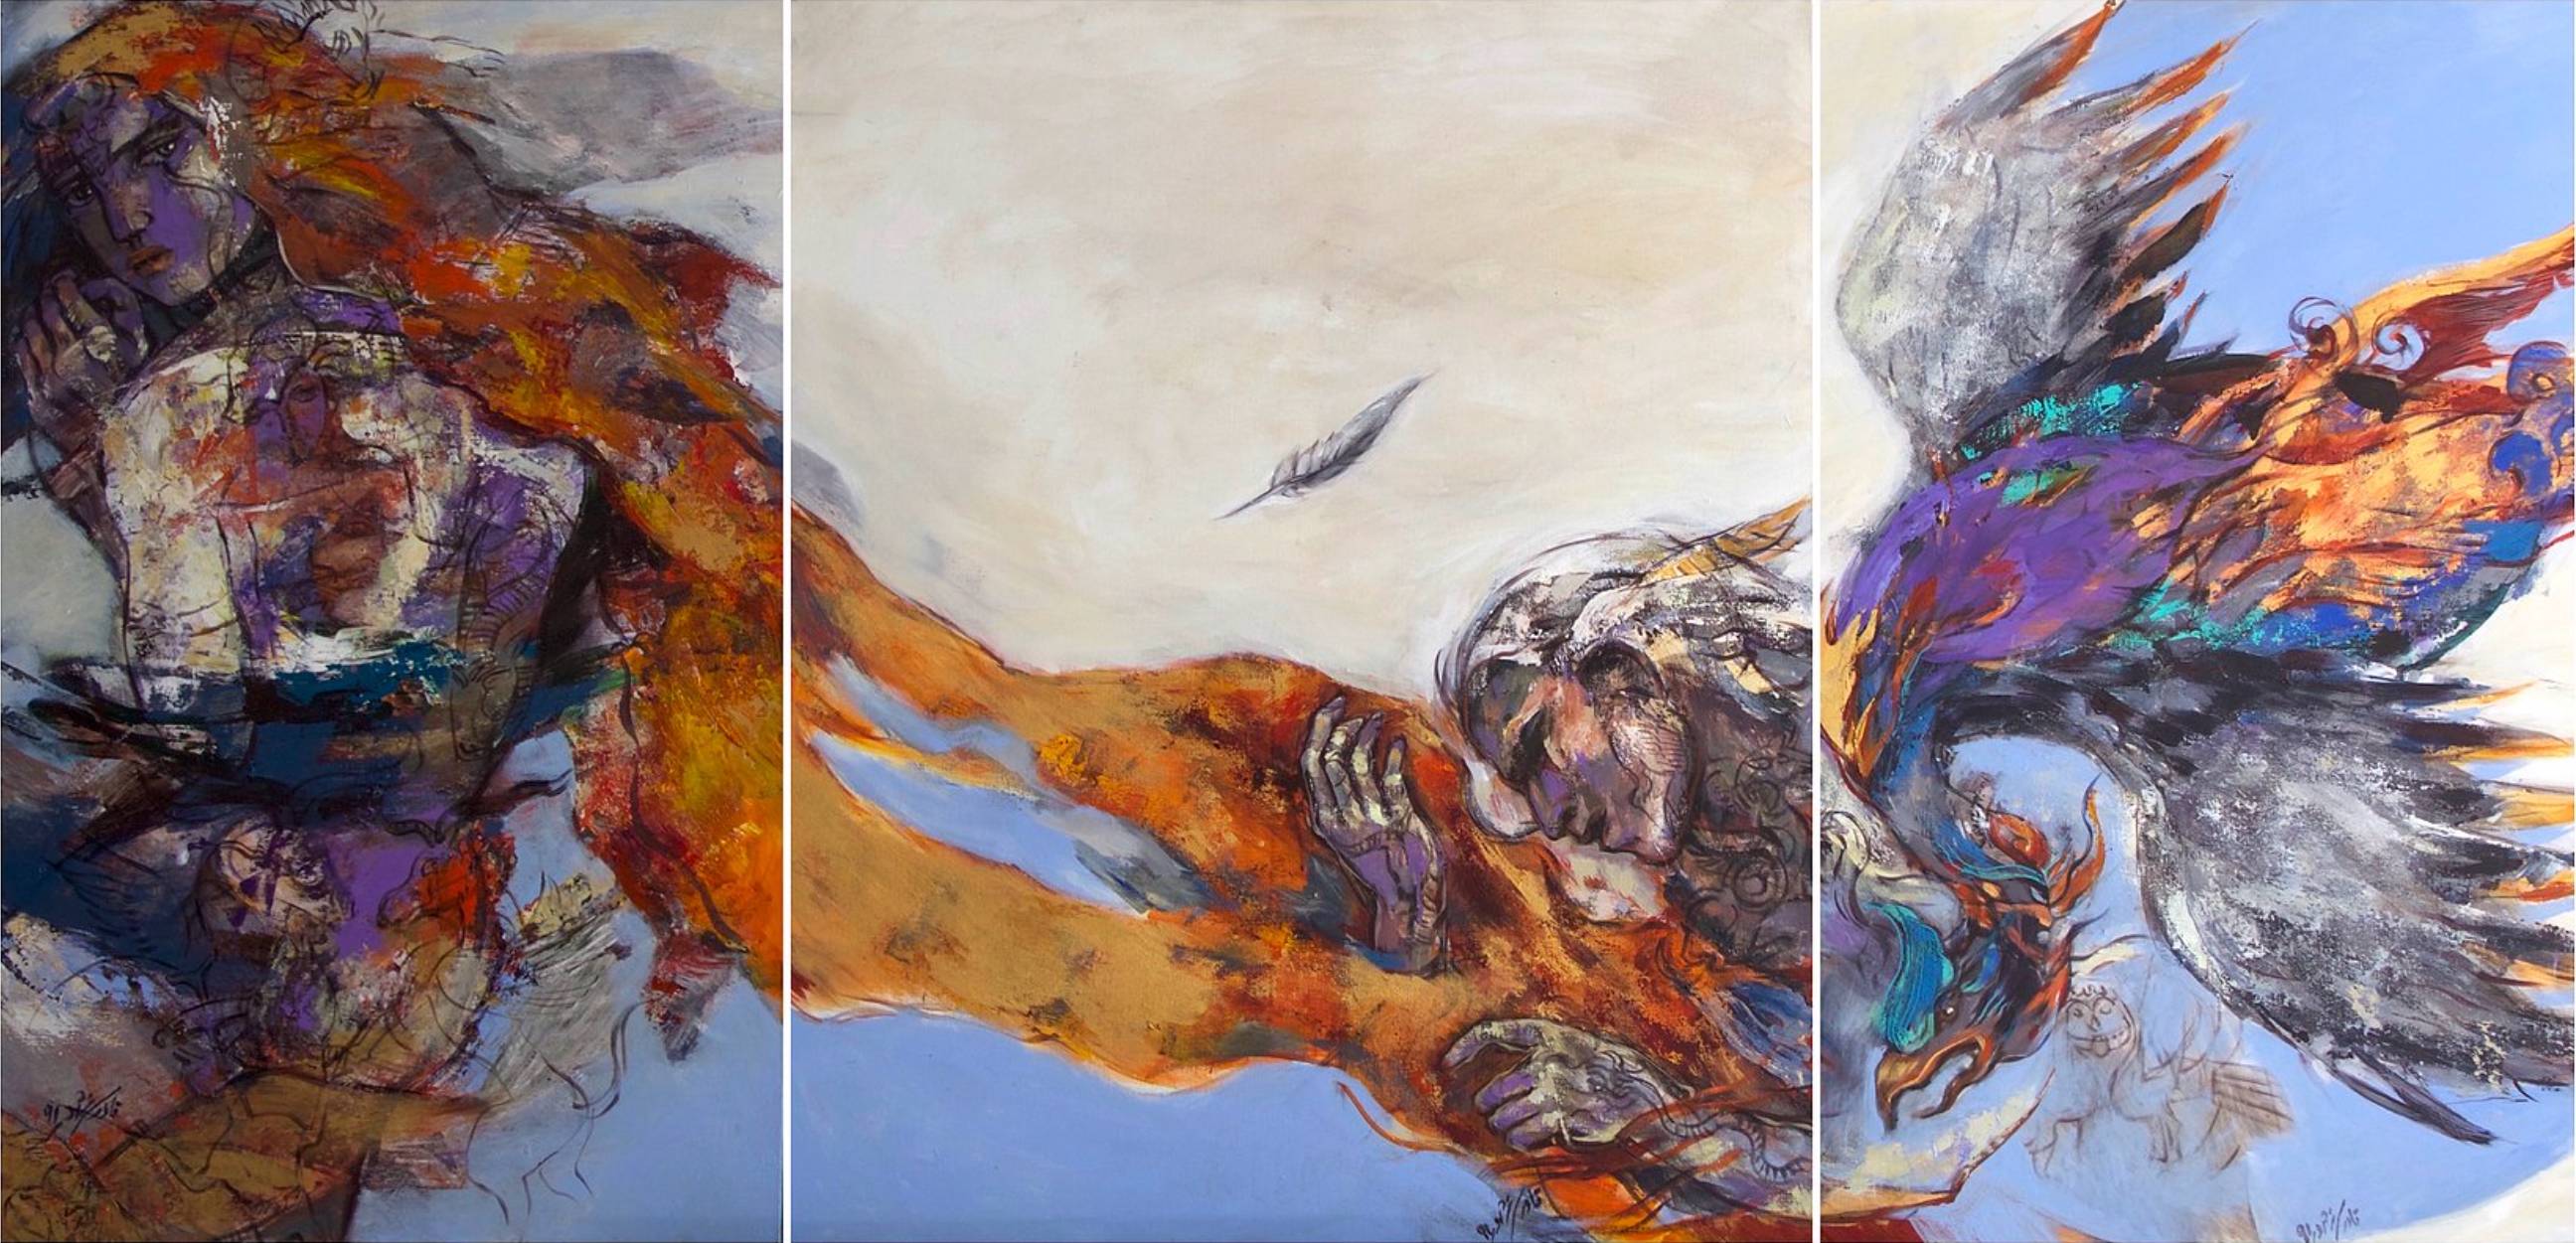 Niloufar Ghaderinejad, Untitled, mixed media on canvas, 120 x 180 cm, 2008